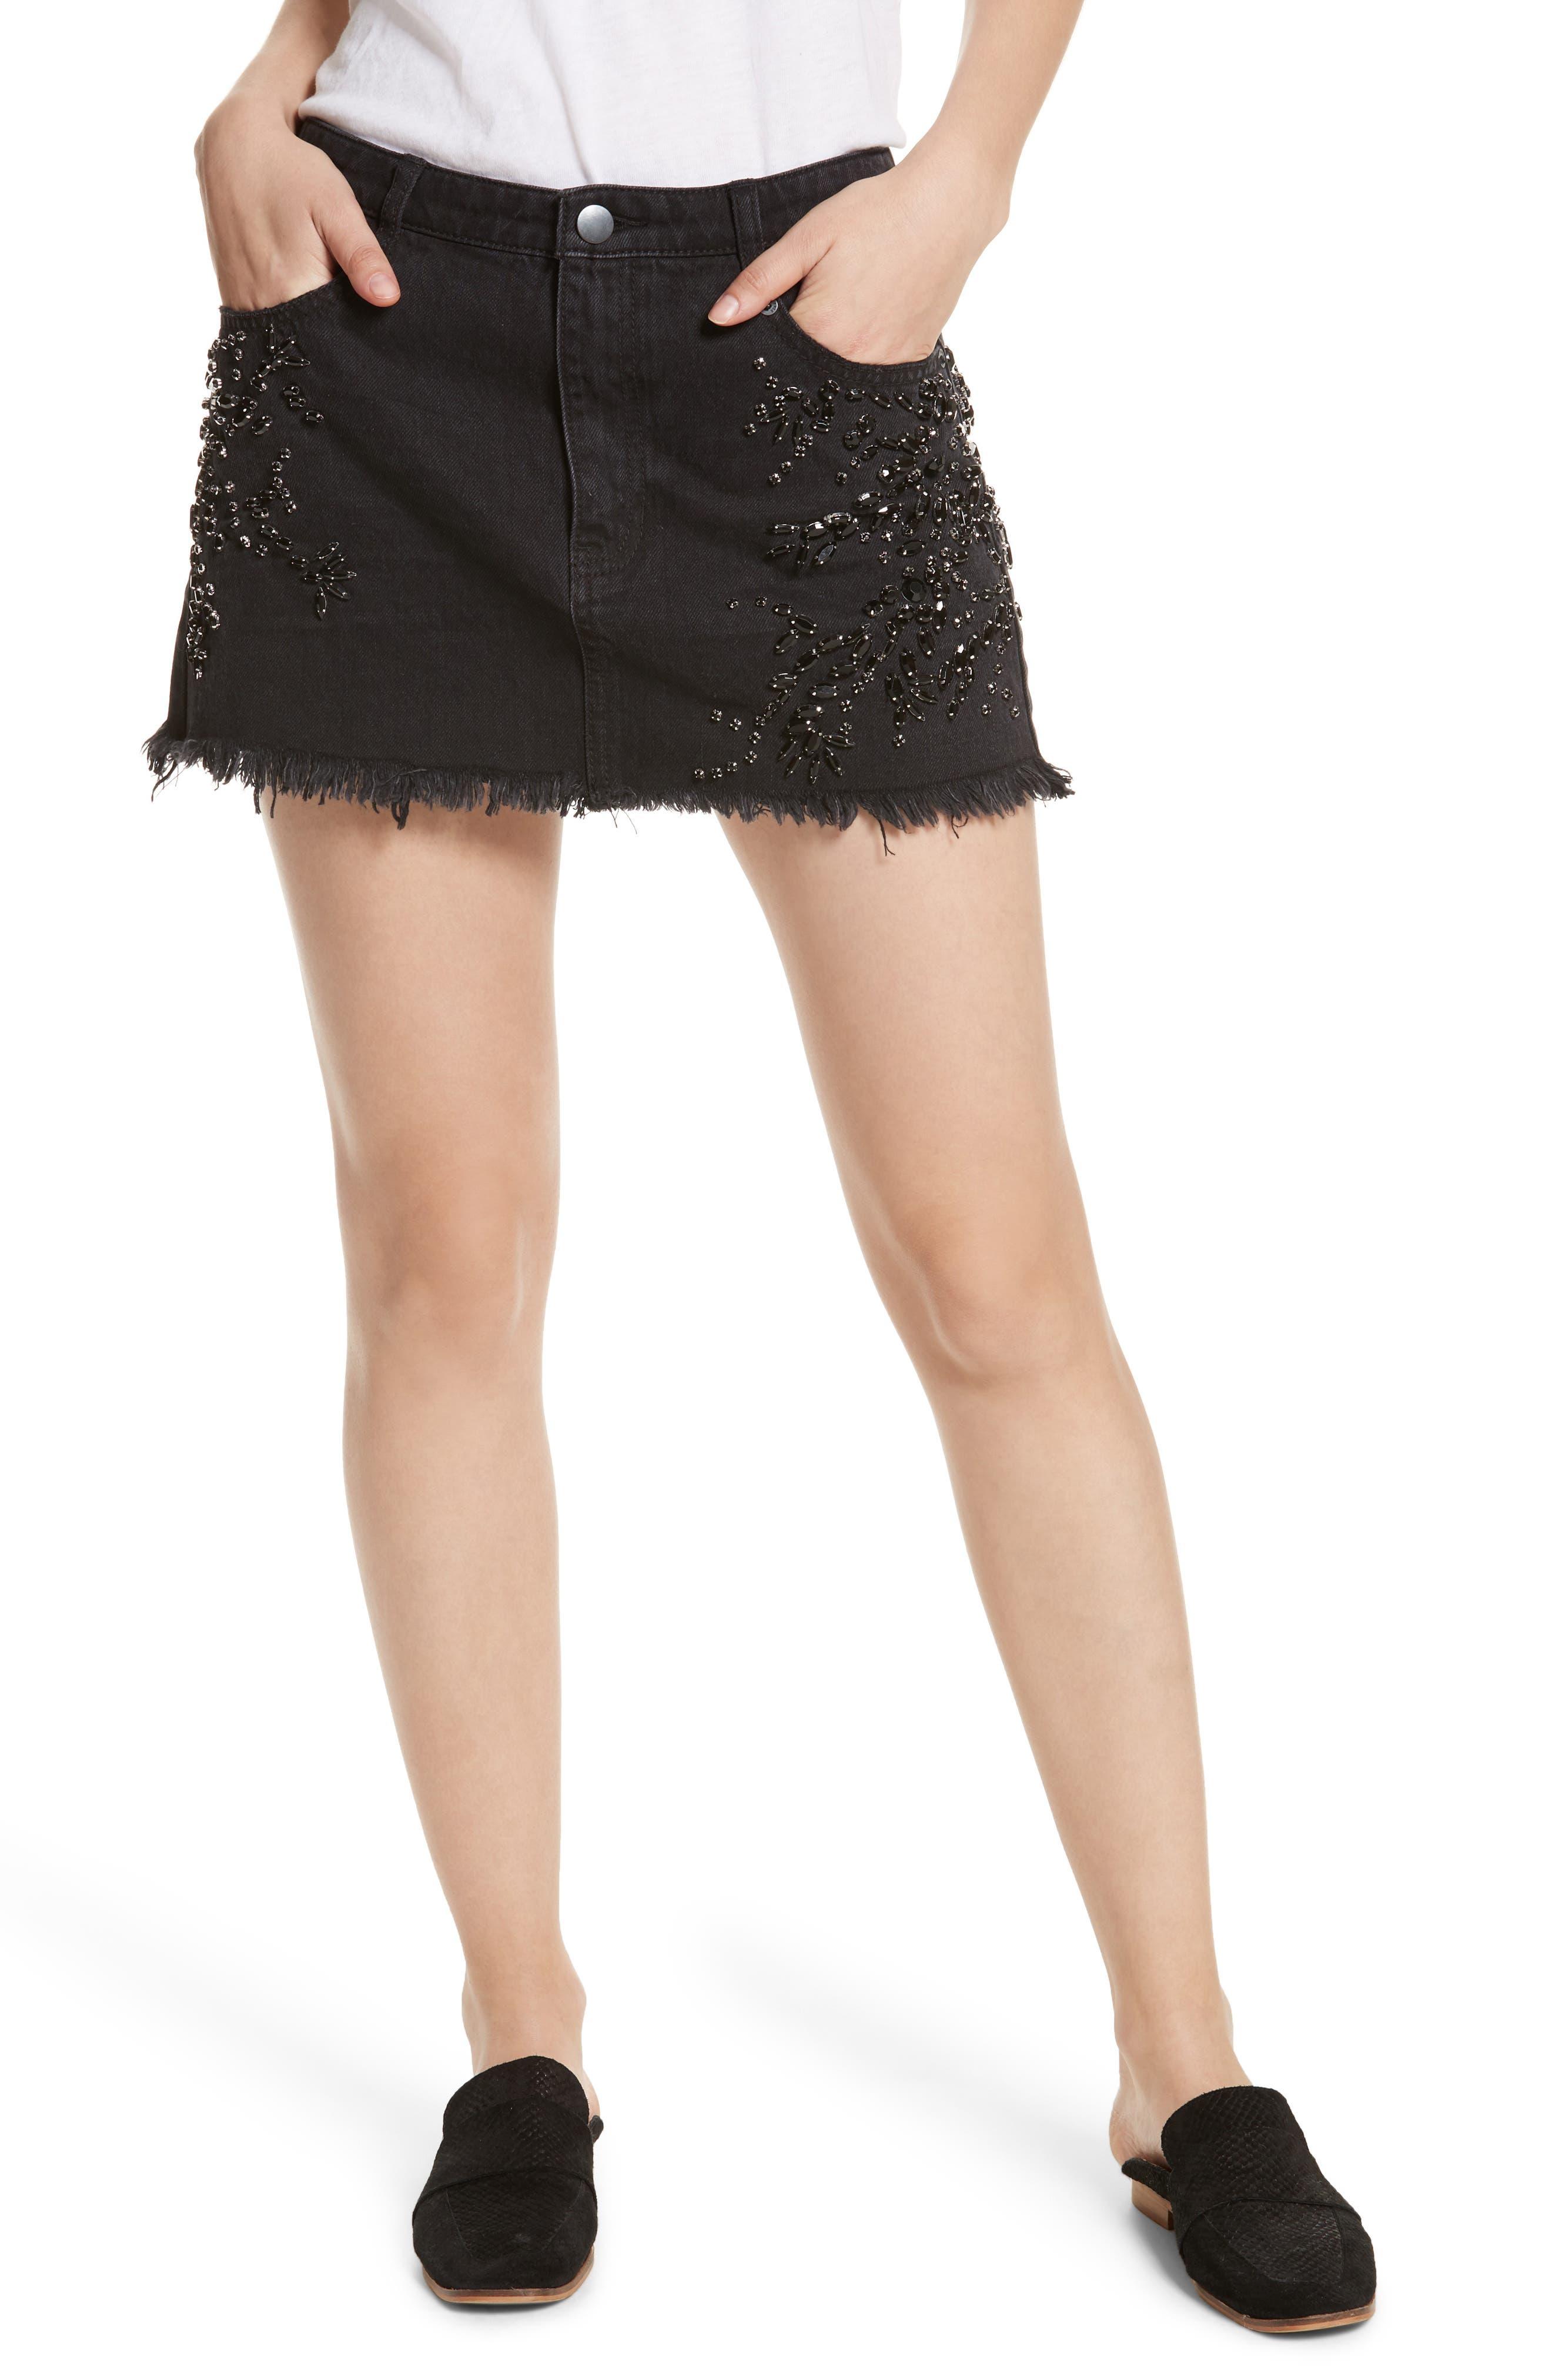 Alternate Image 1 Selected - Free People Shine Bright Shine Far Beaded Miniskirt